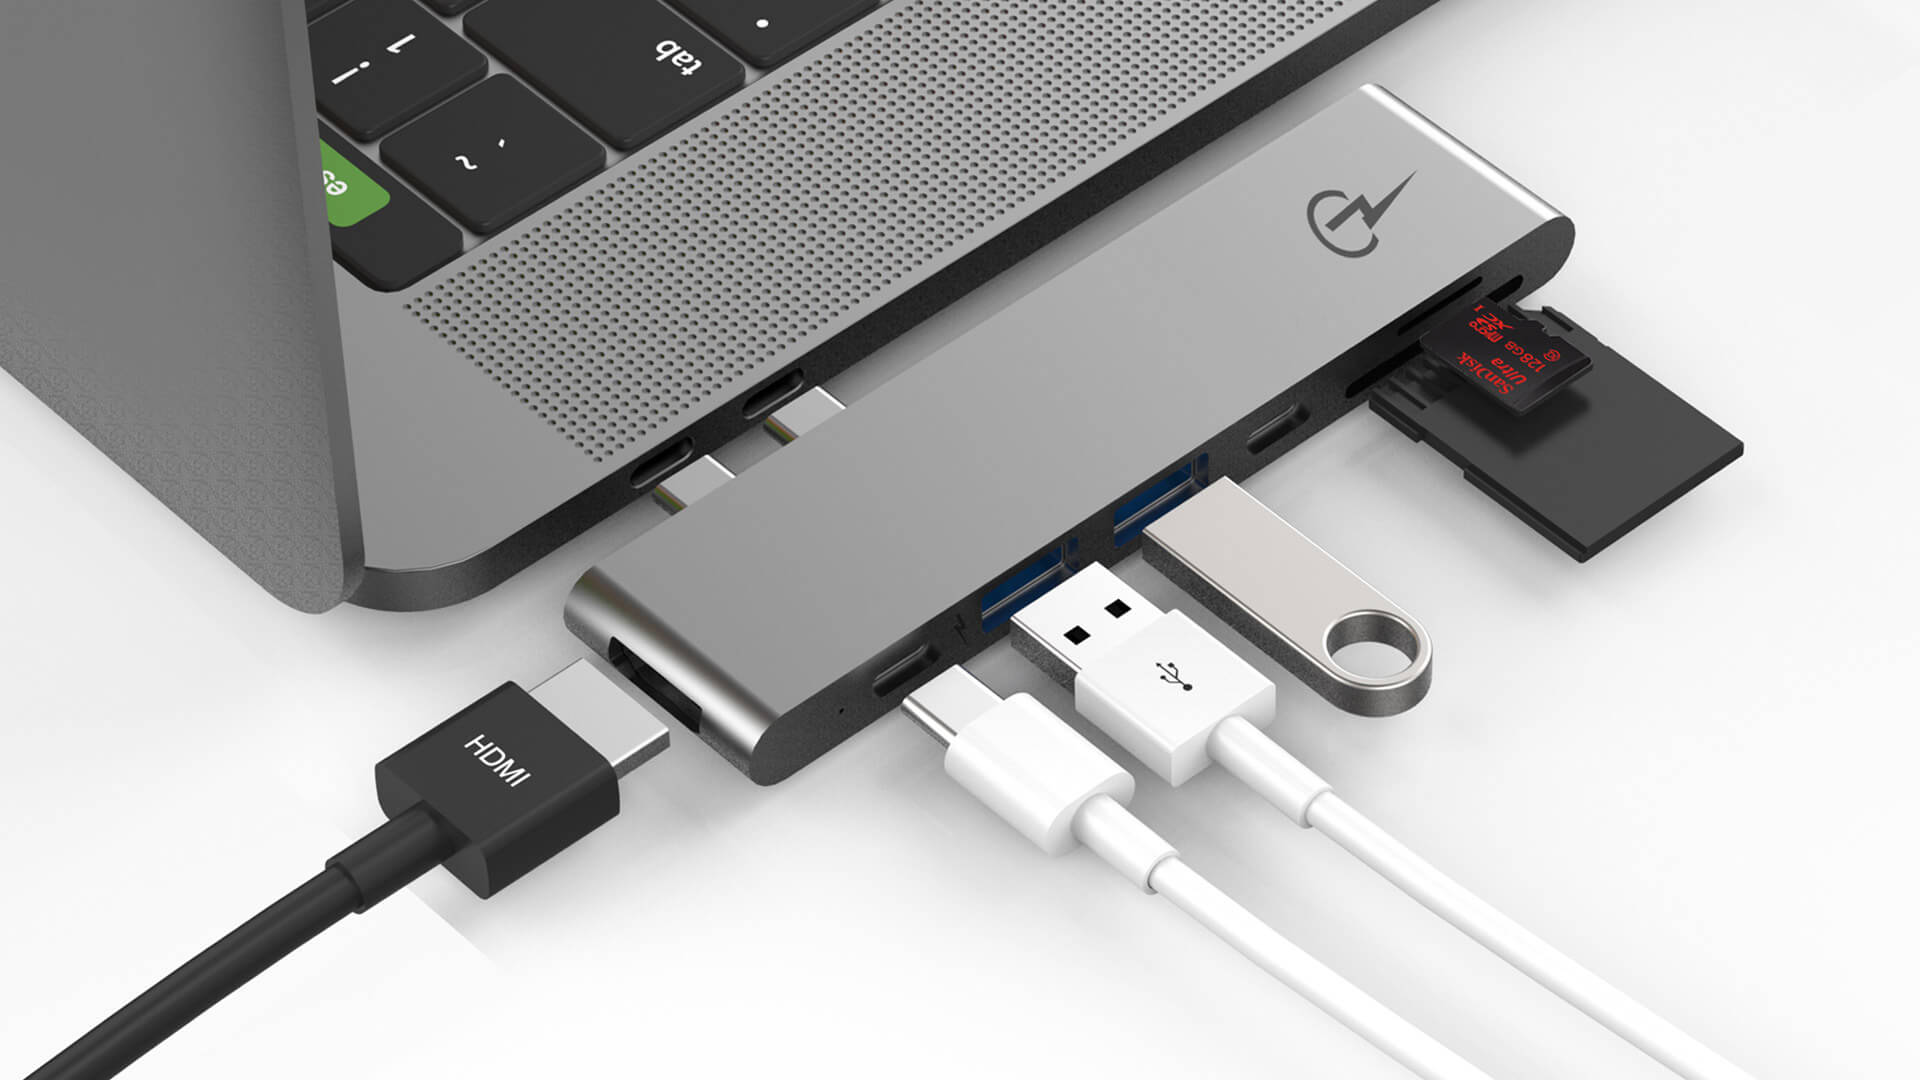 Best USB-C Hubs for MacBook Pro in 2021 - iGeeksBlog